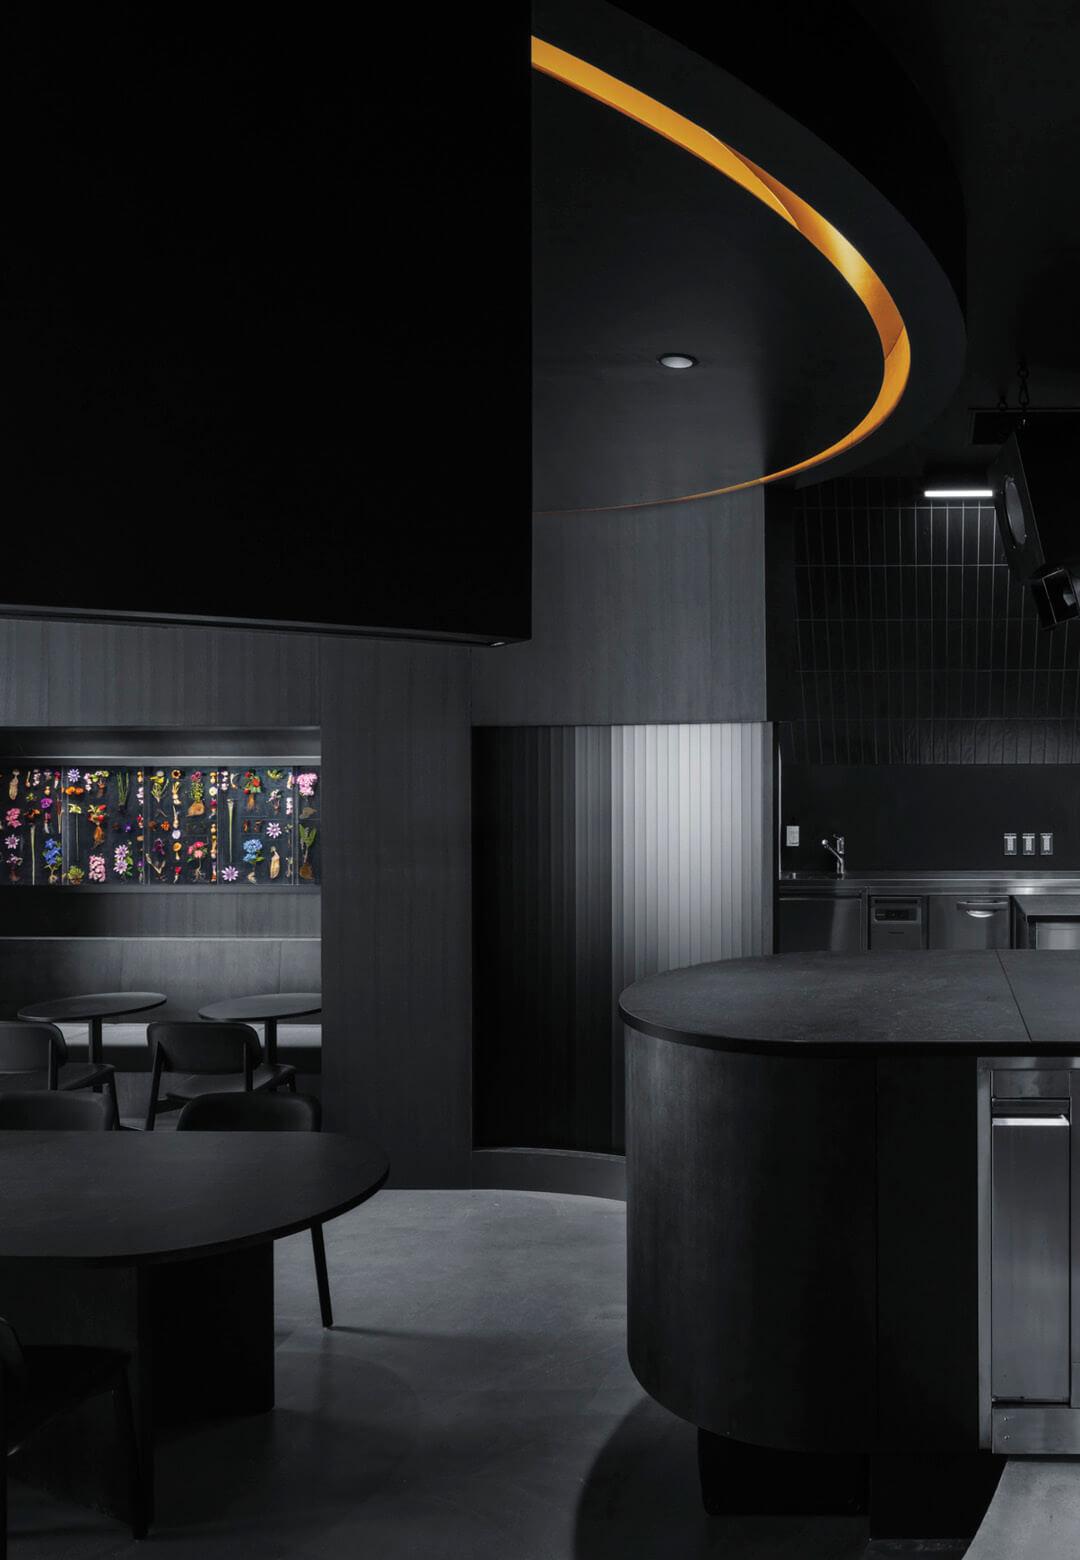 Burnside Tokyo designed by Snøhetta in collaboration with Ghetto Gastro and kooo architects | Burnside Restaurant by Snøhetta | STIRworld